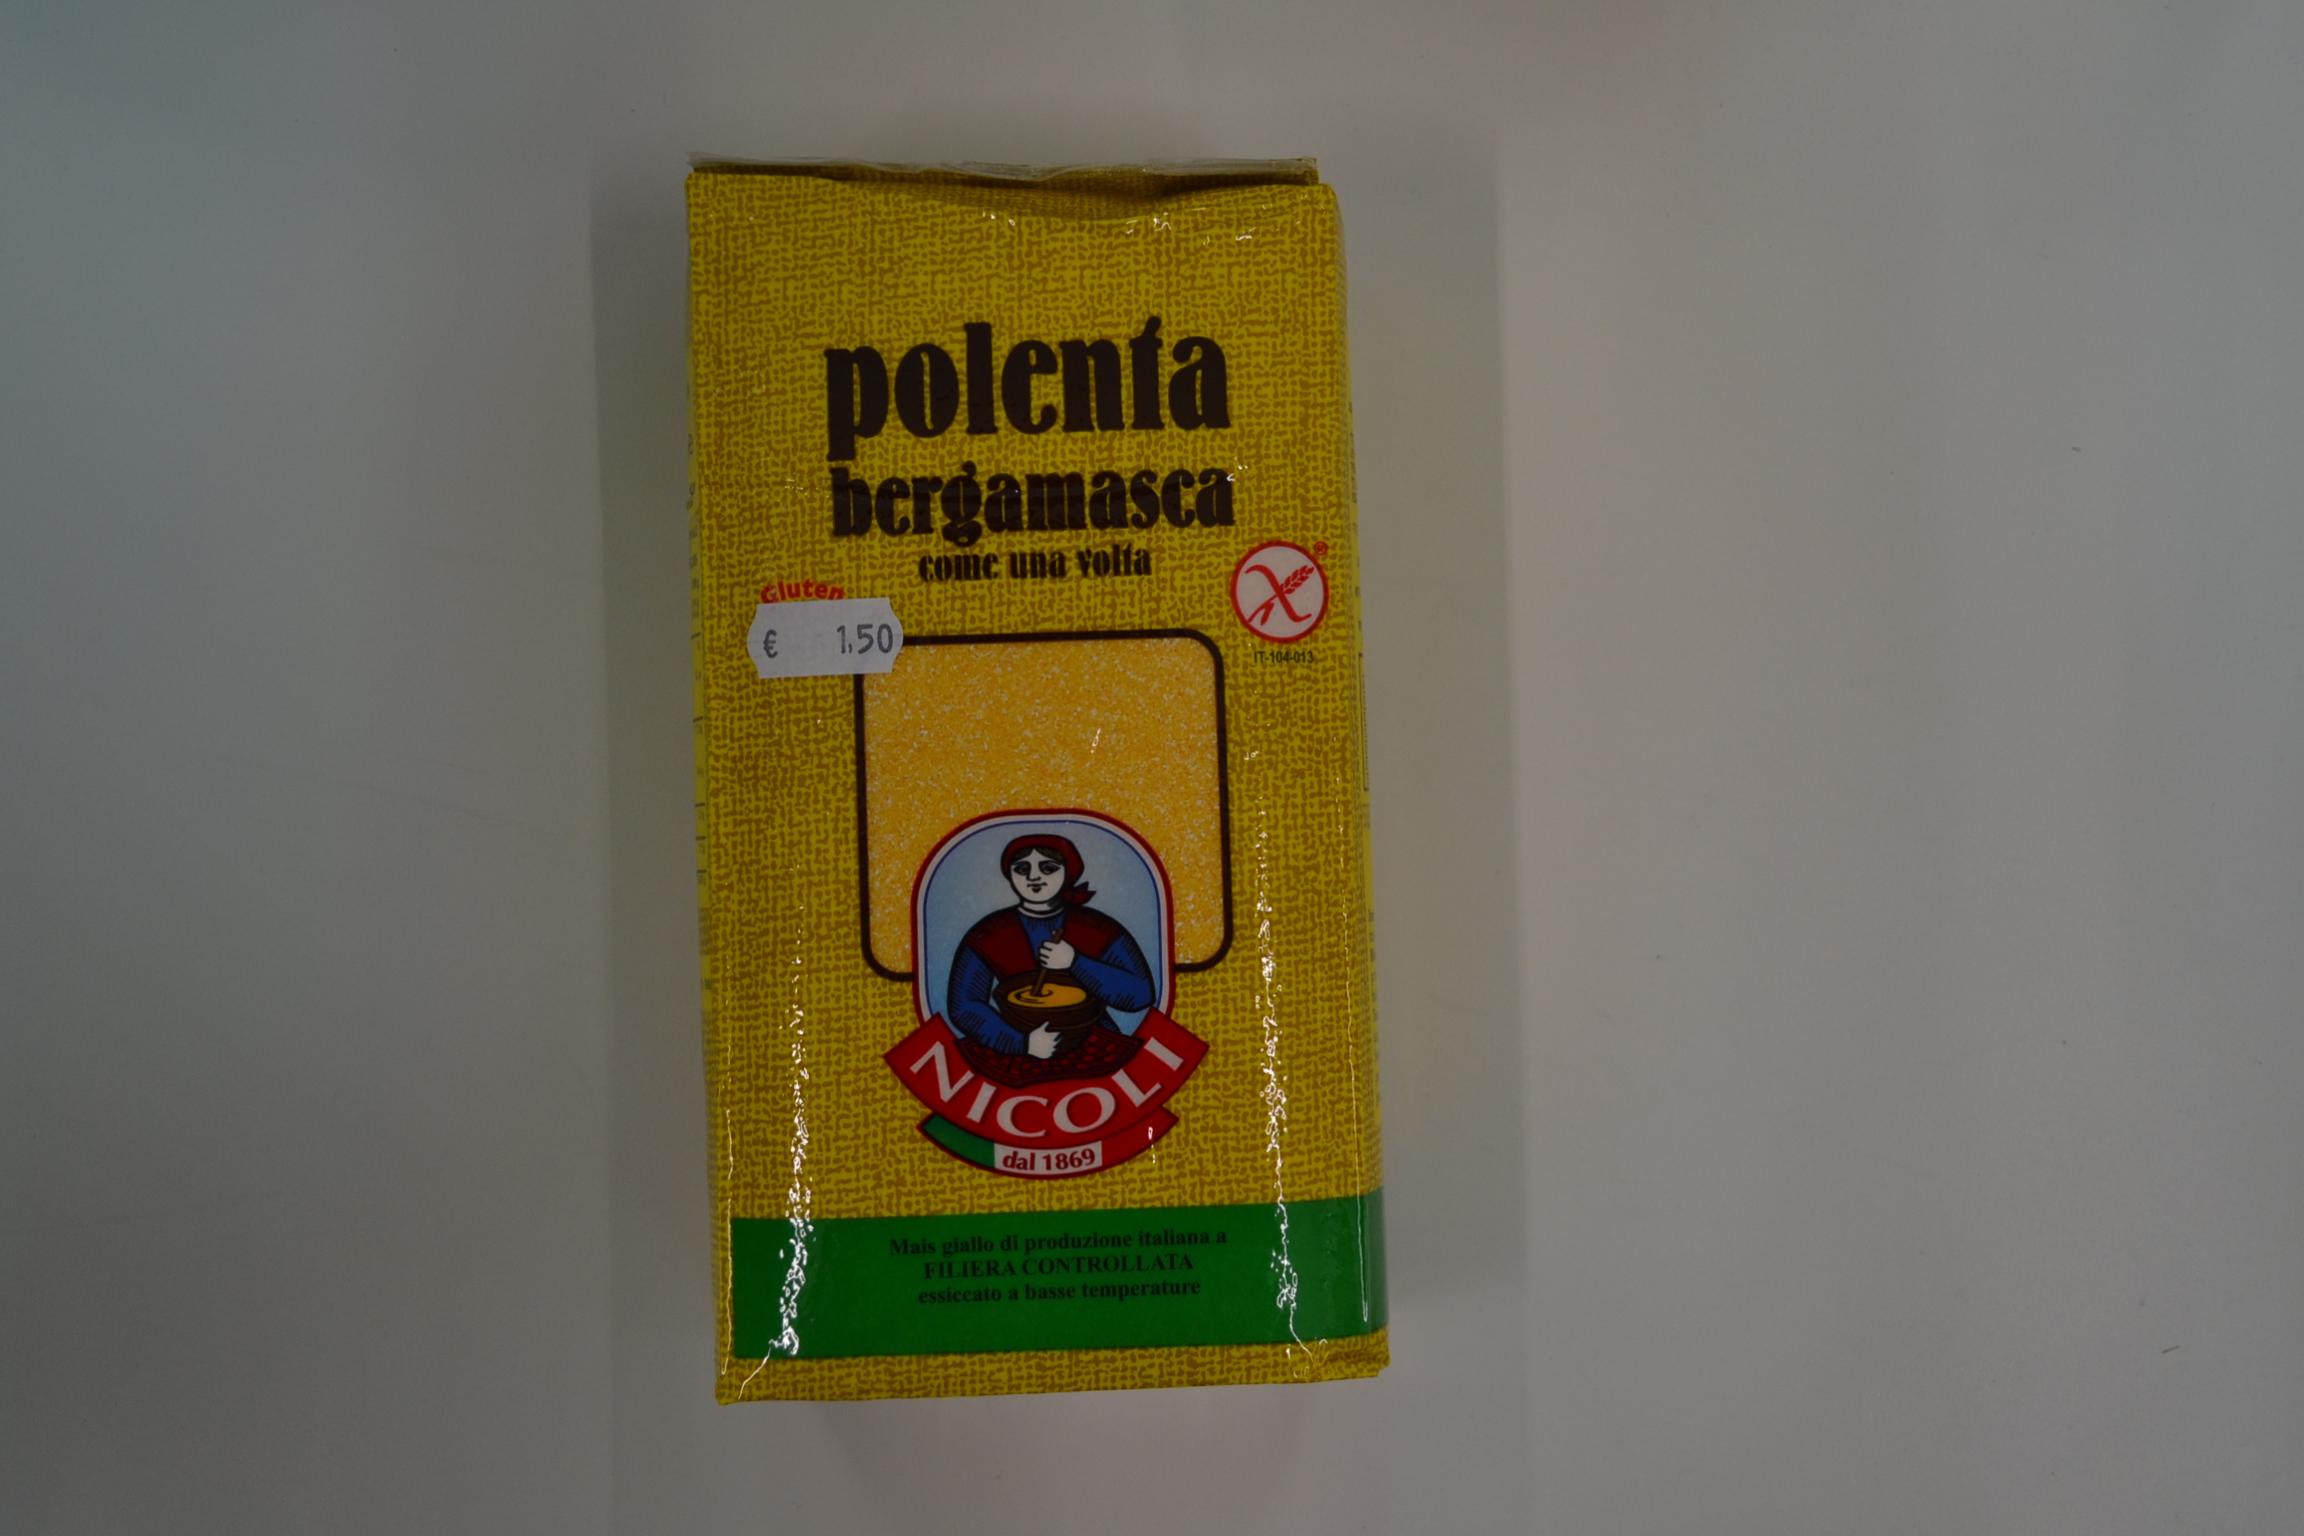 Polenta bergamasca NICOLI € 1,50